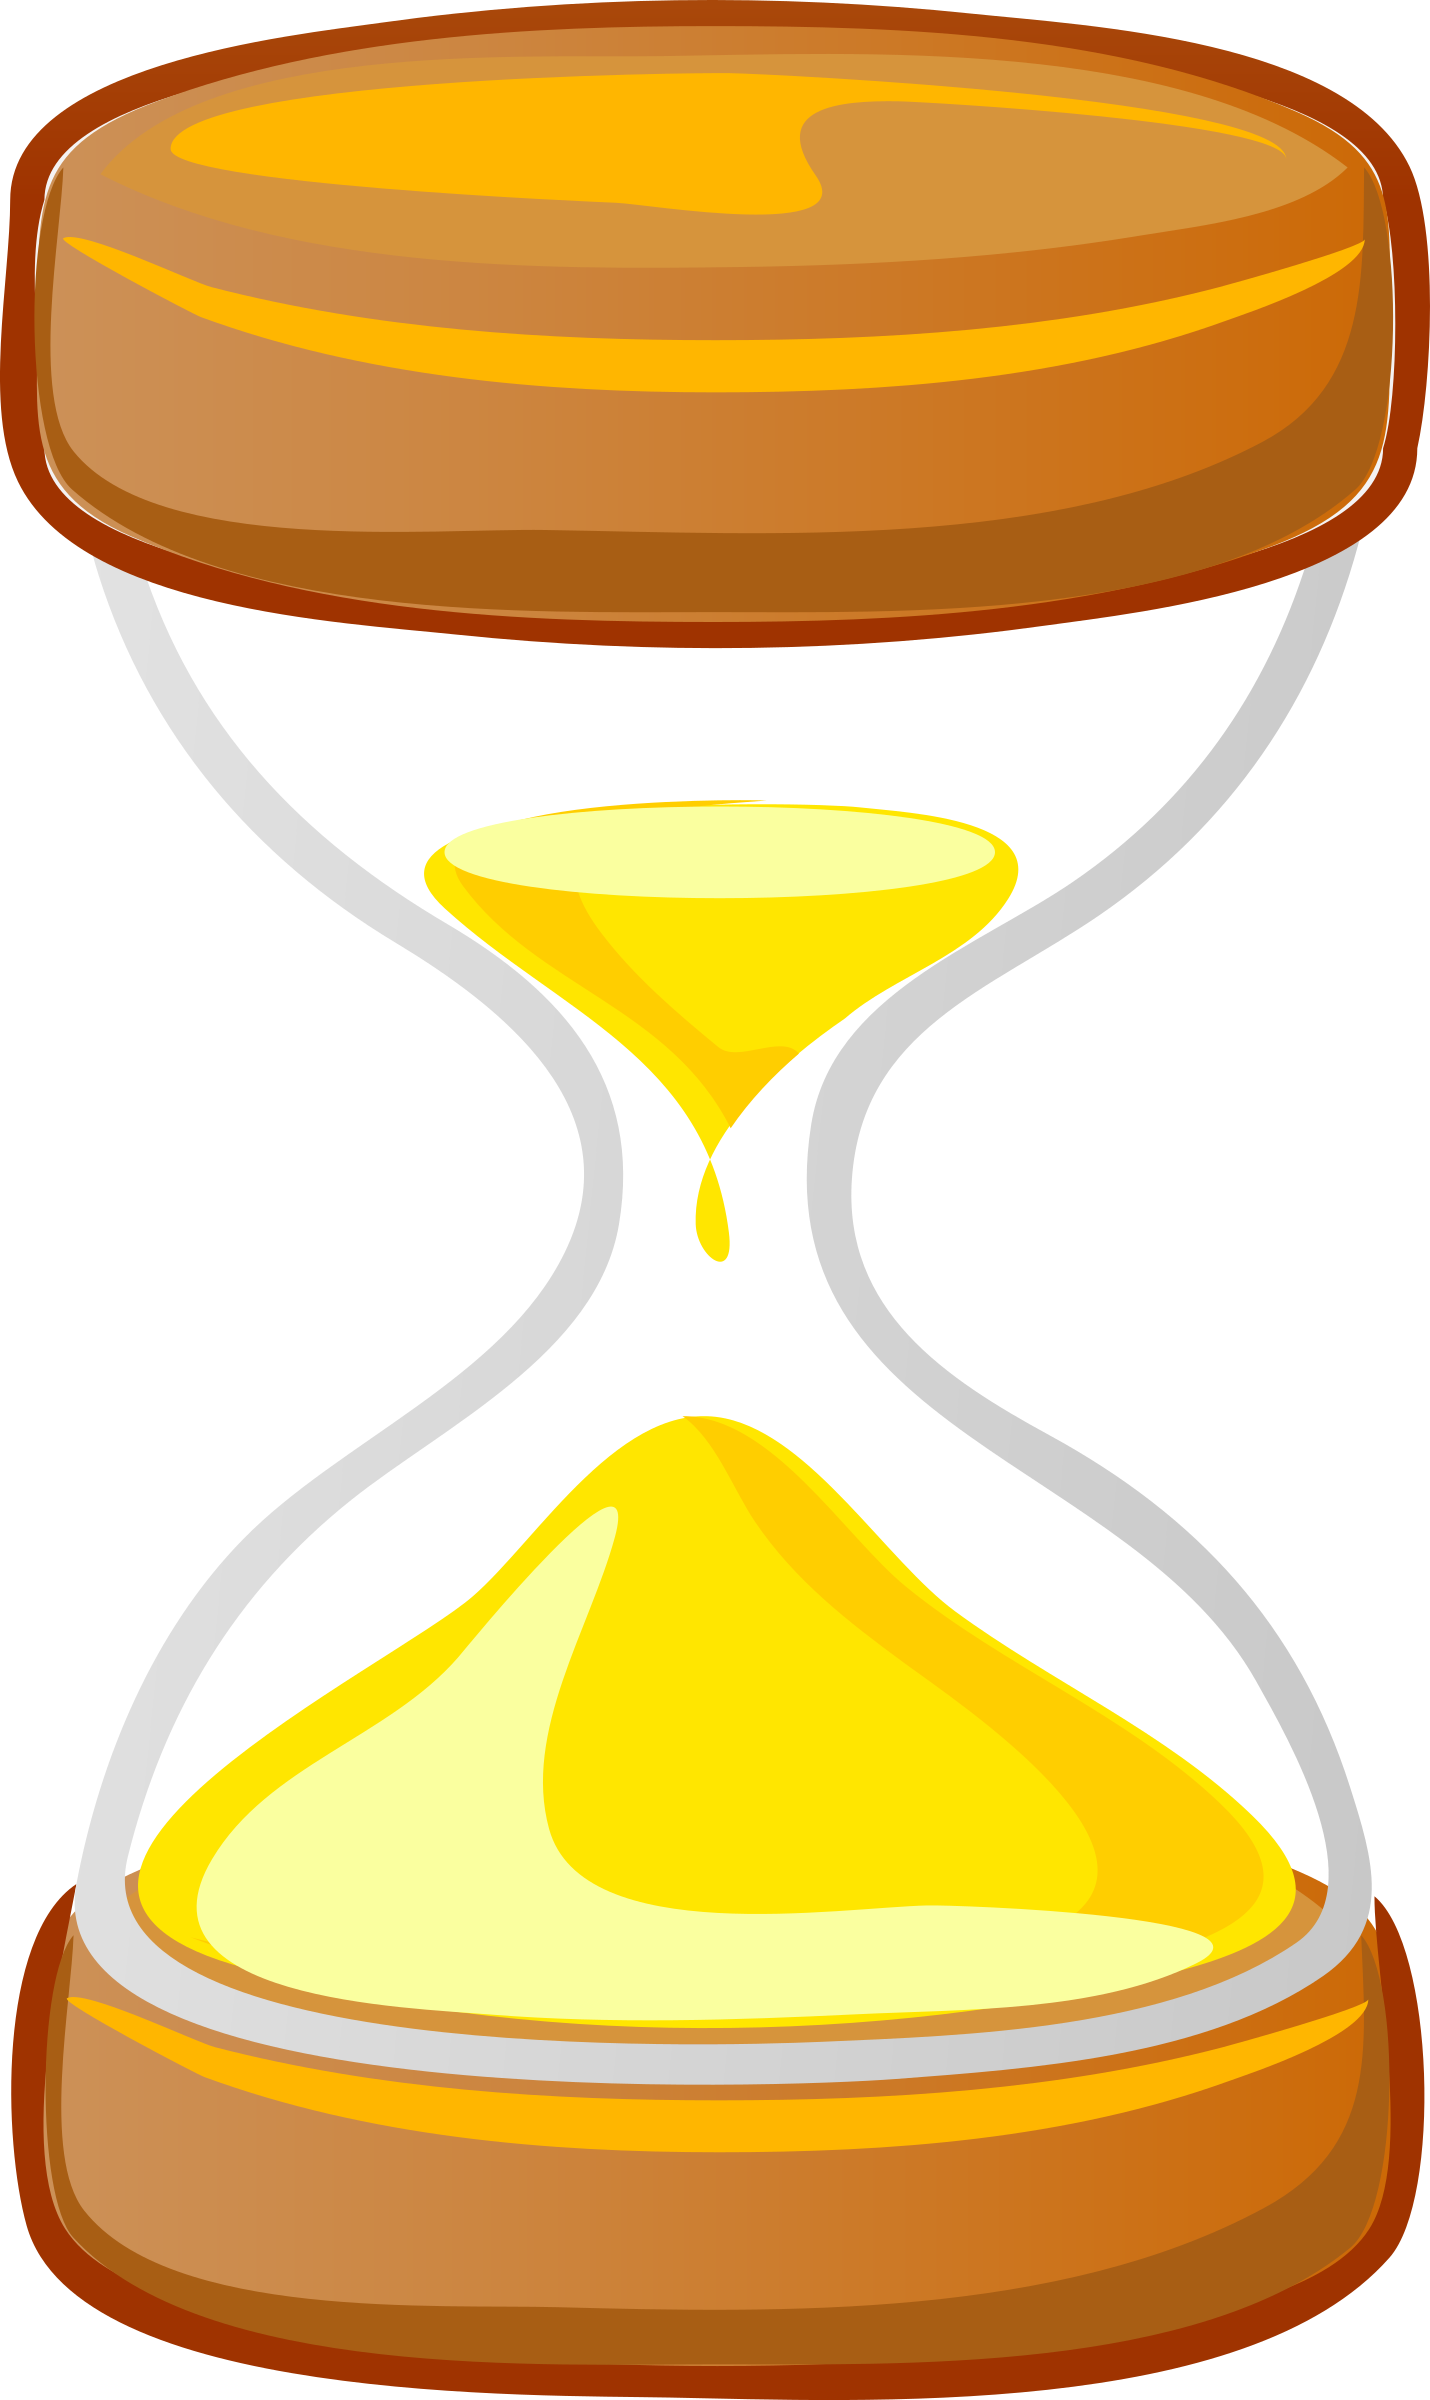 Clocks clipart yellow. Architetto clessidra big image